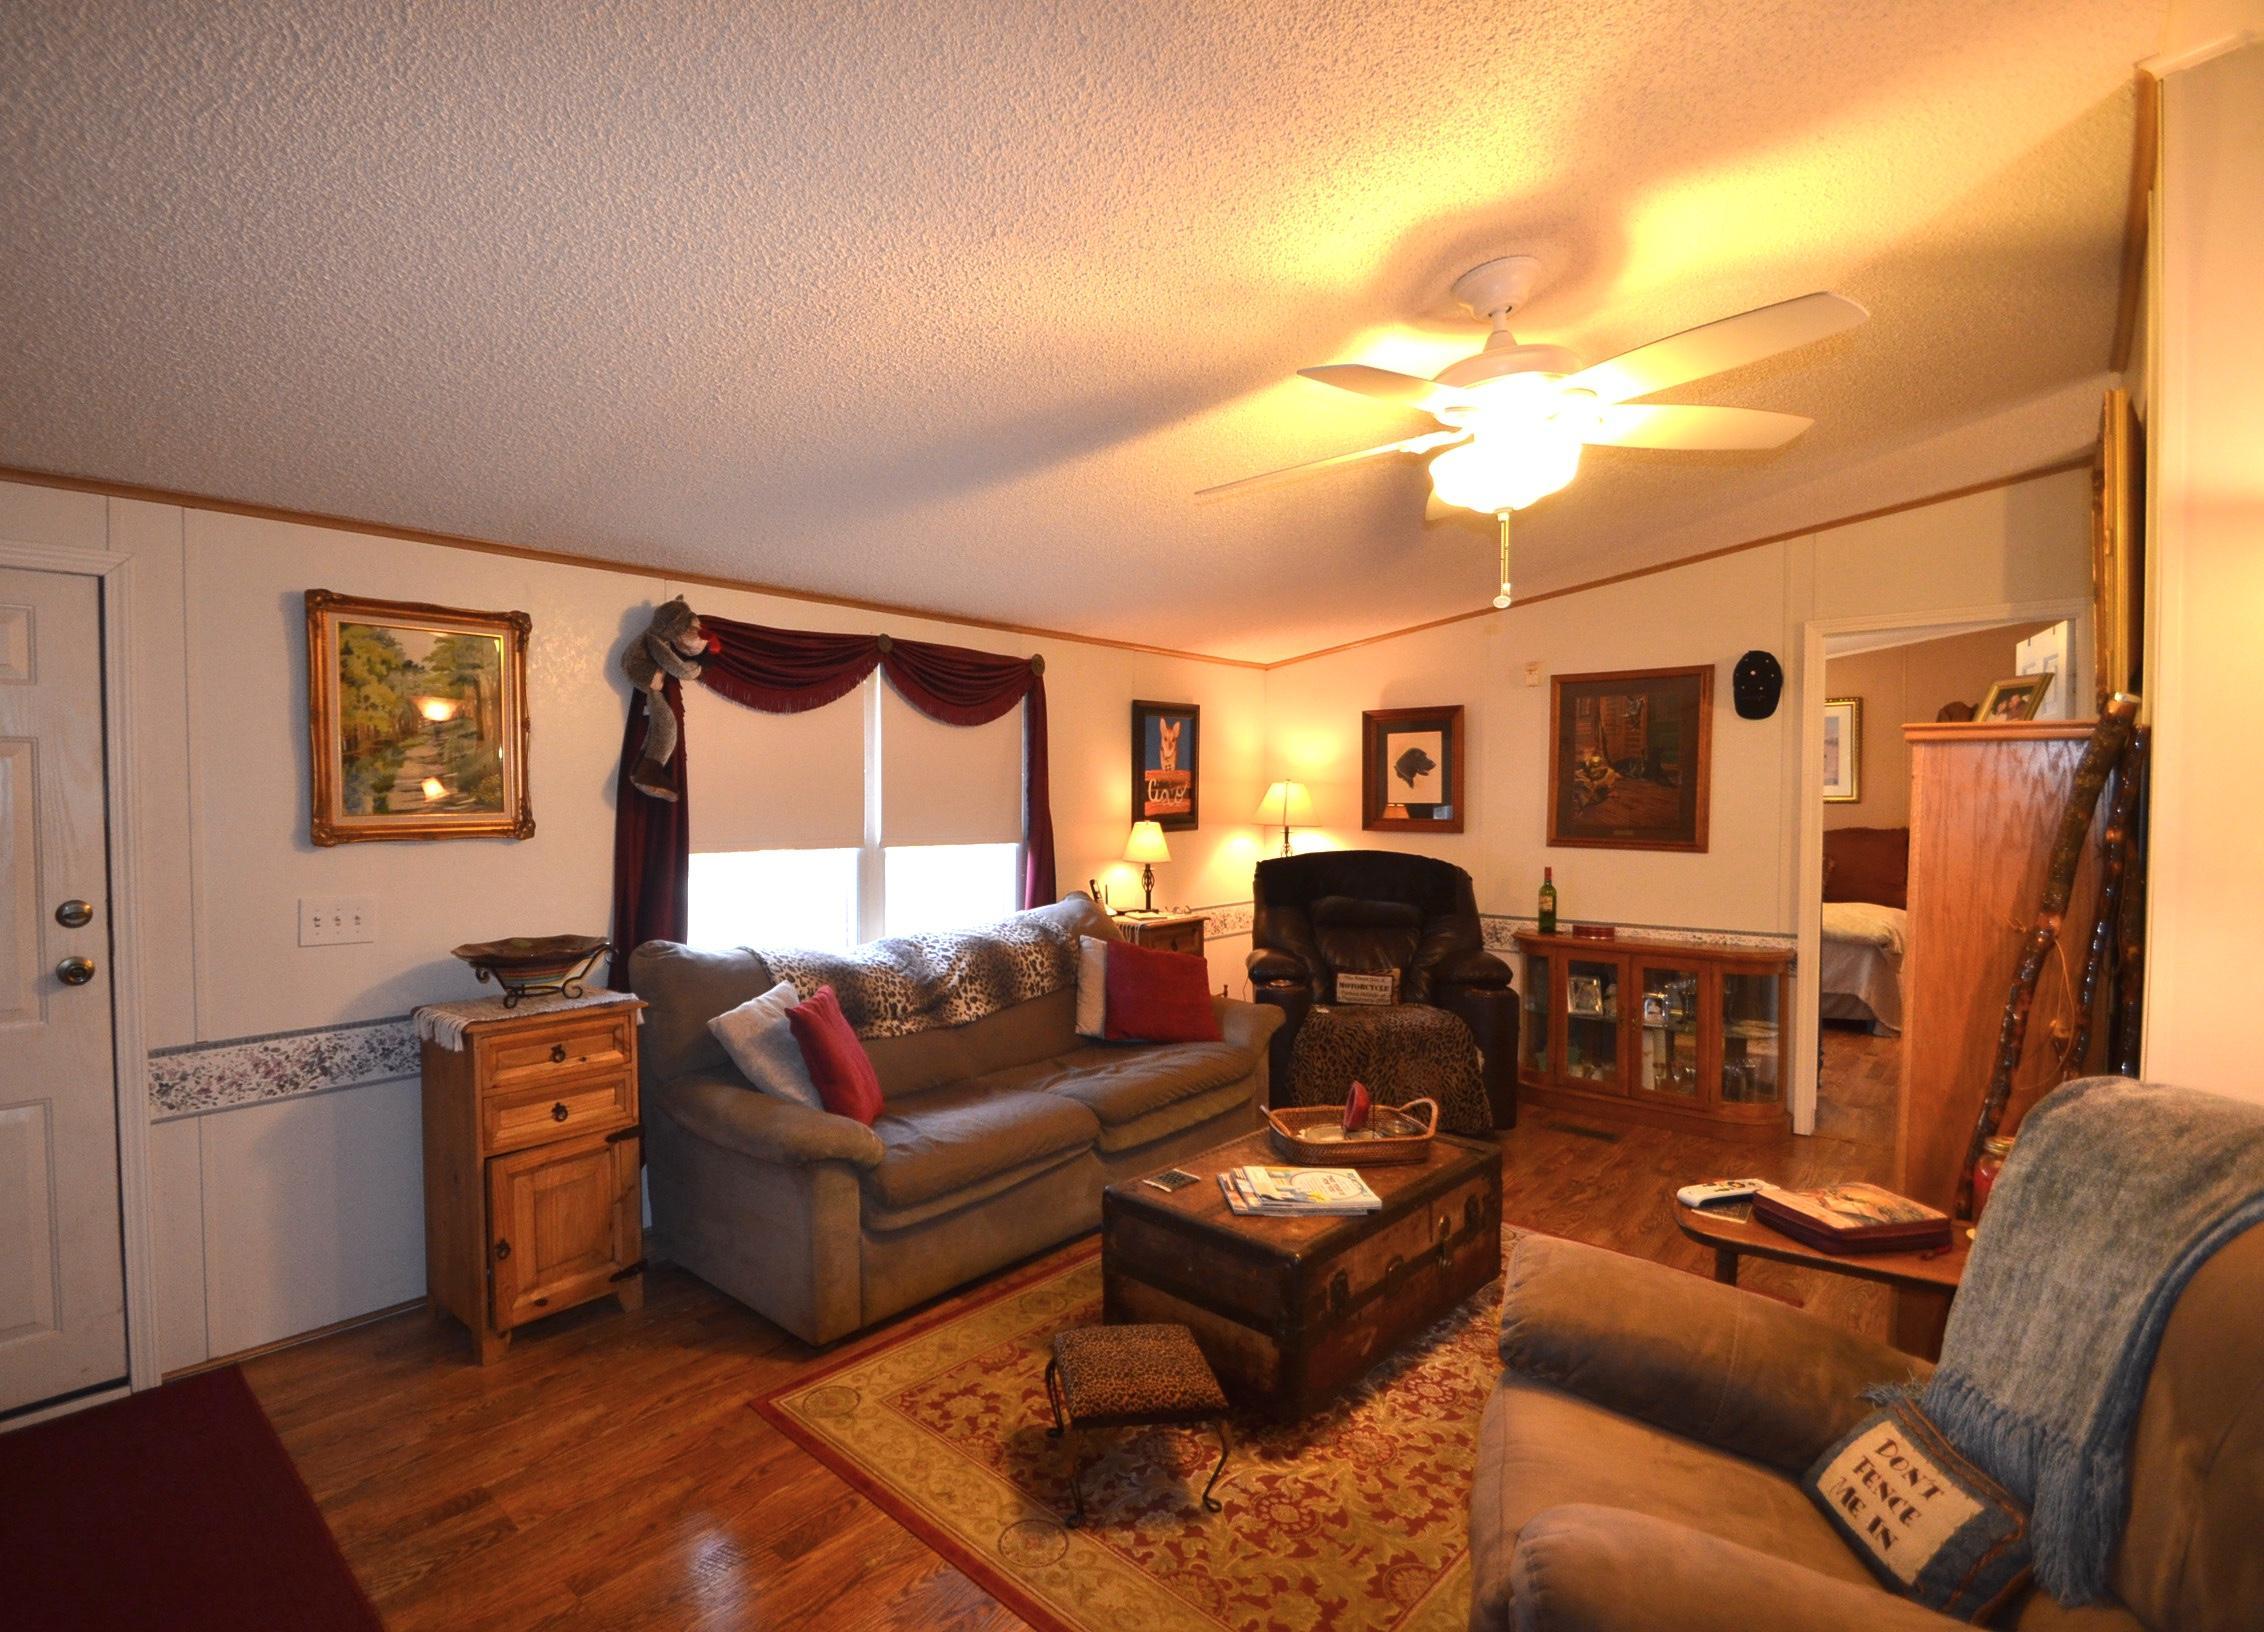 MLS# 16003579 | 1150 Old Macbeth Road Bonneau SC | Santee Circle subdivision